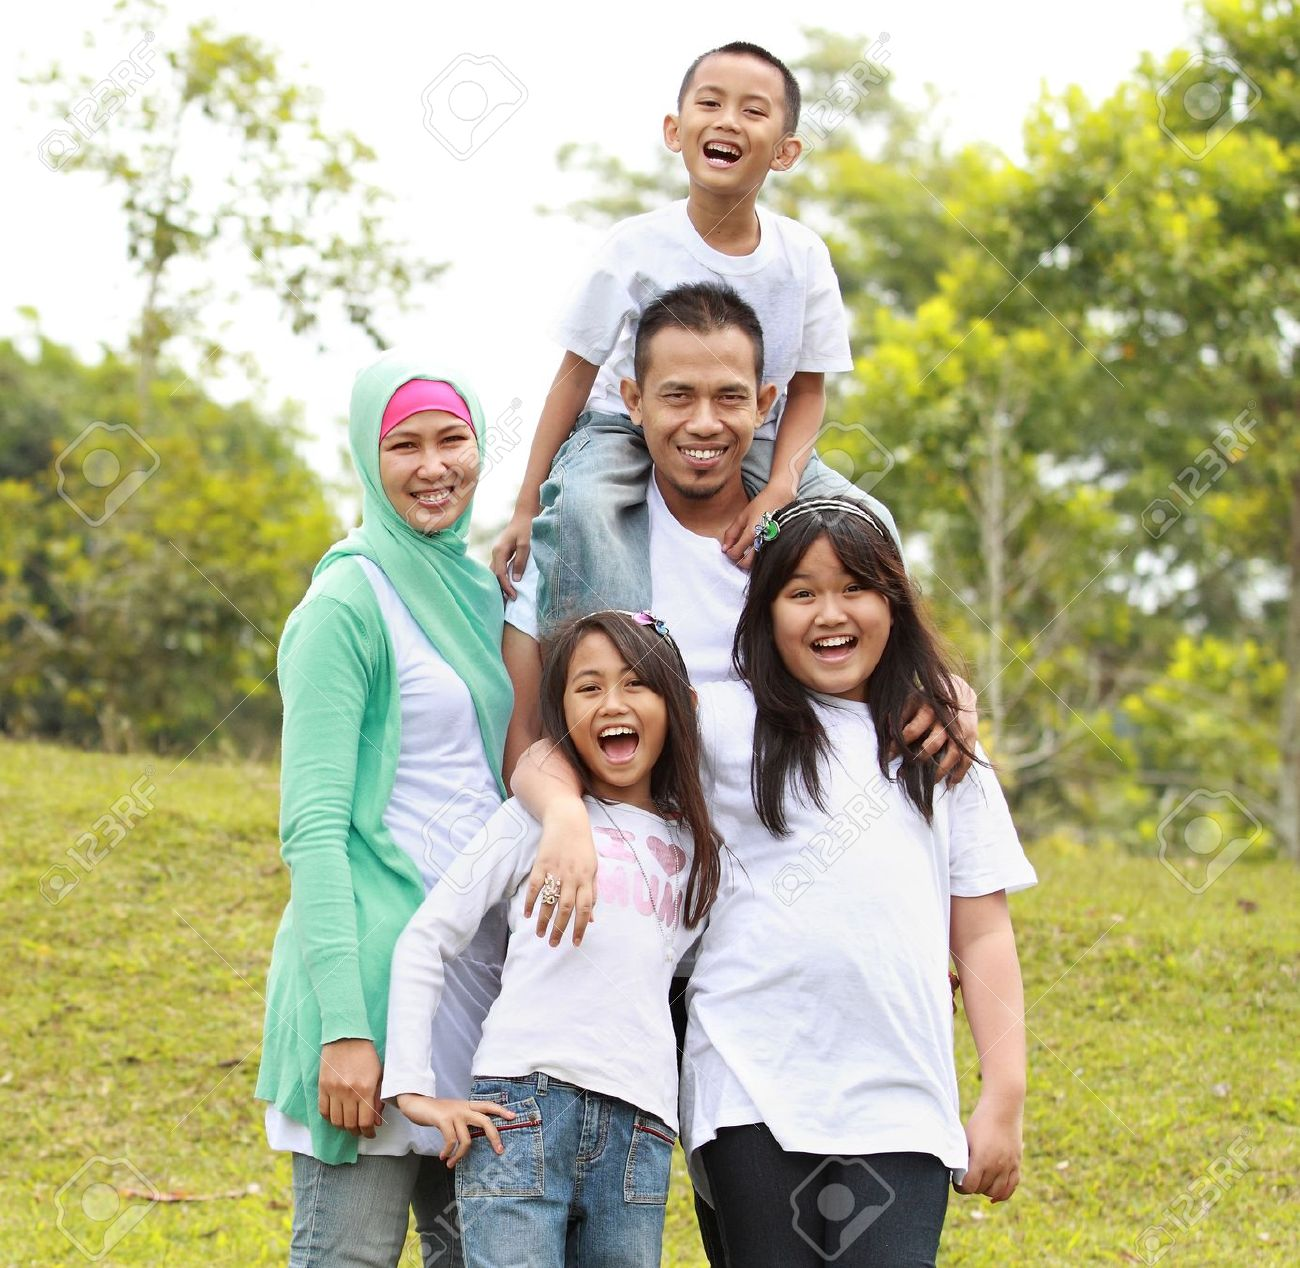 Portrait of Happy Family In Park Stock Photo - 10409882